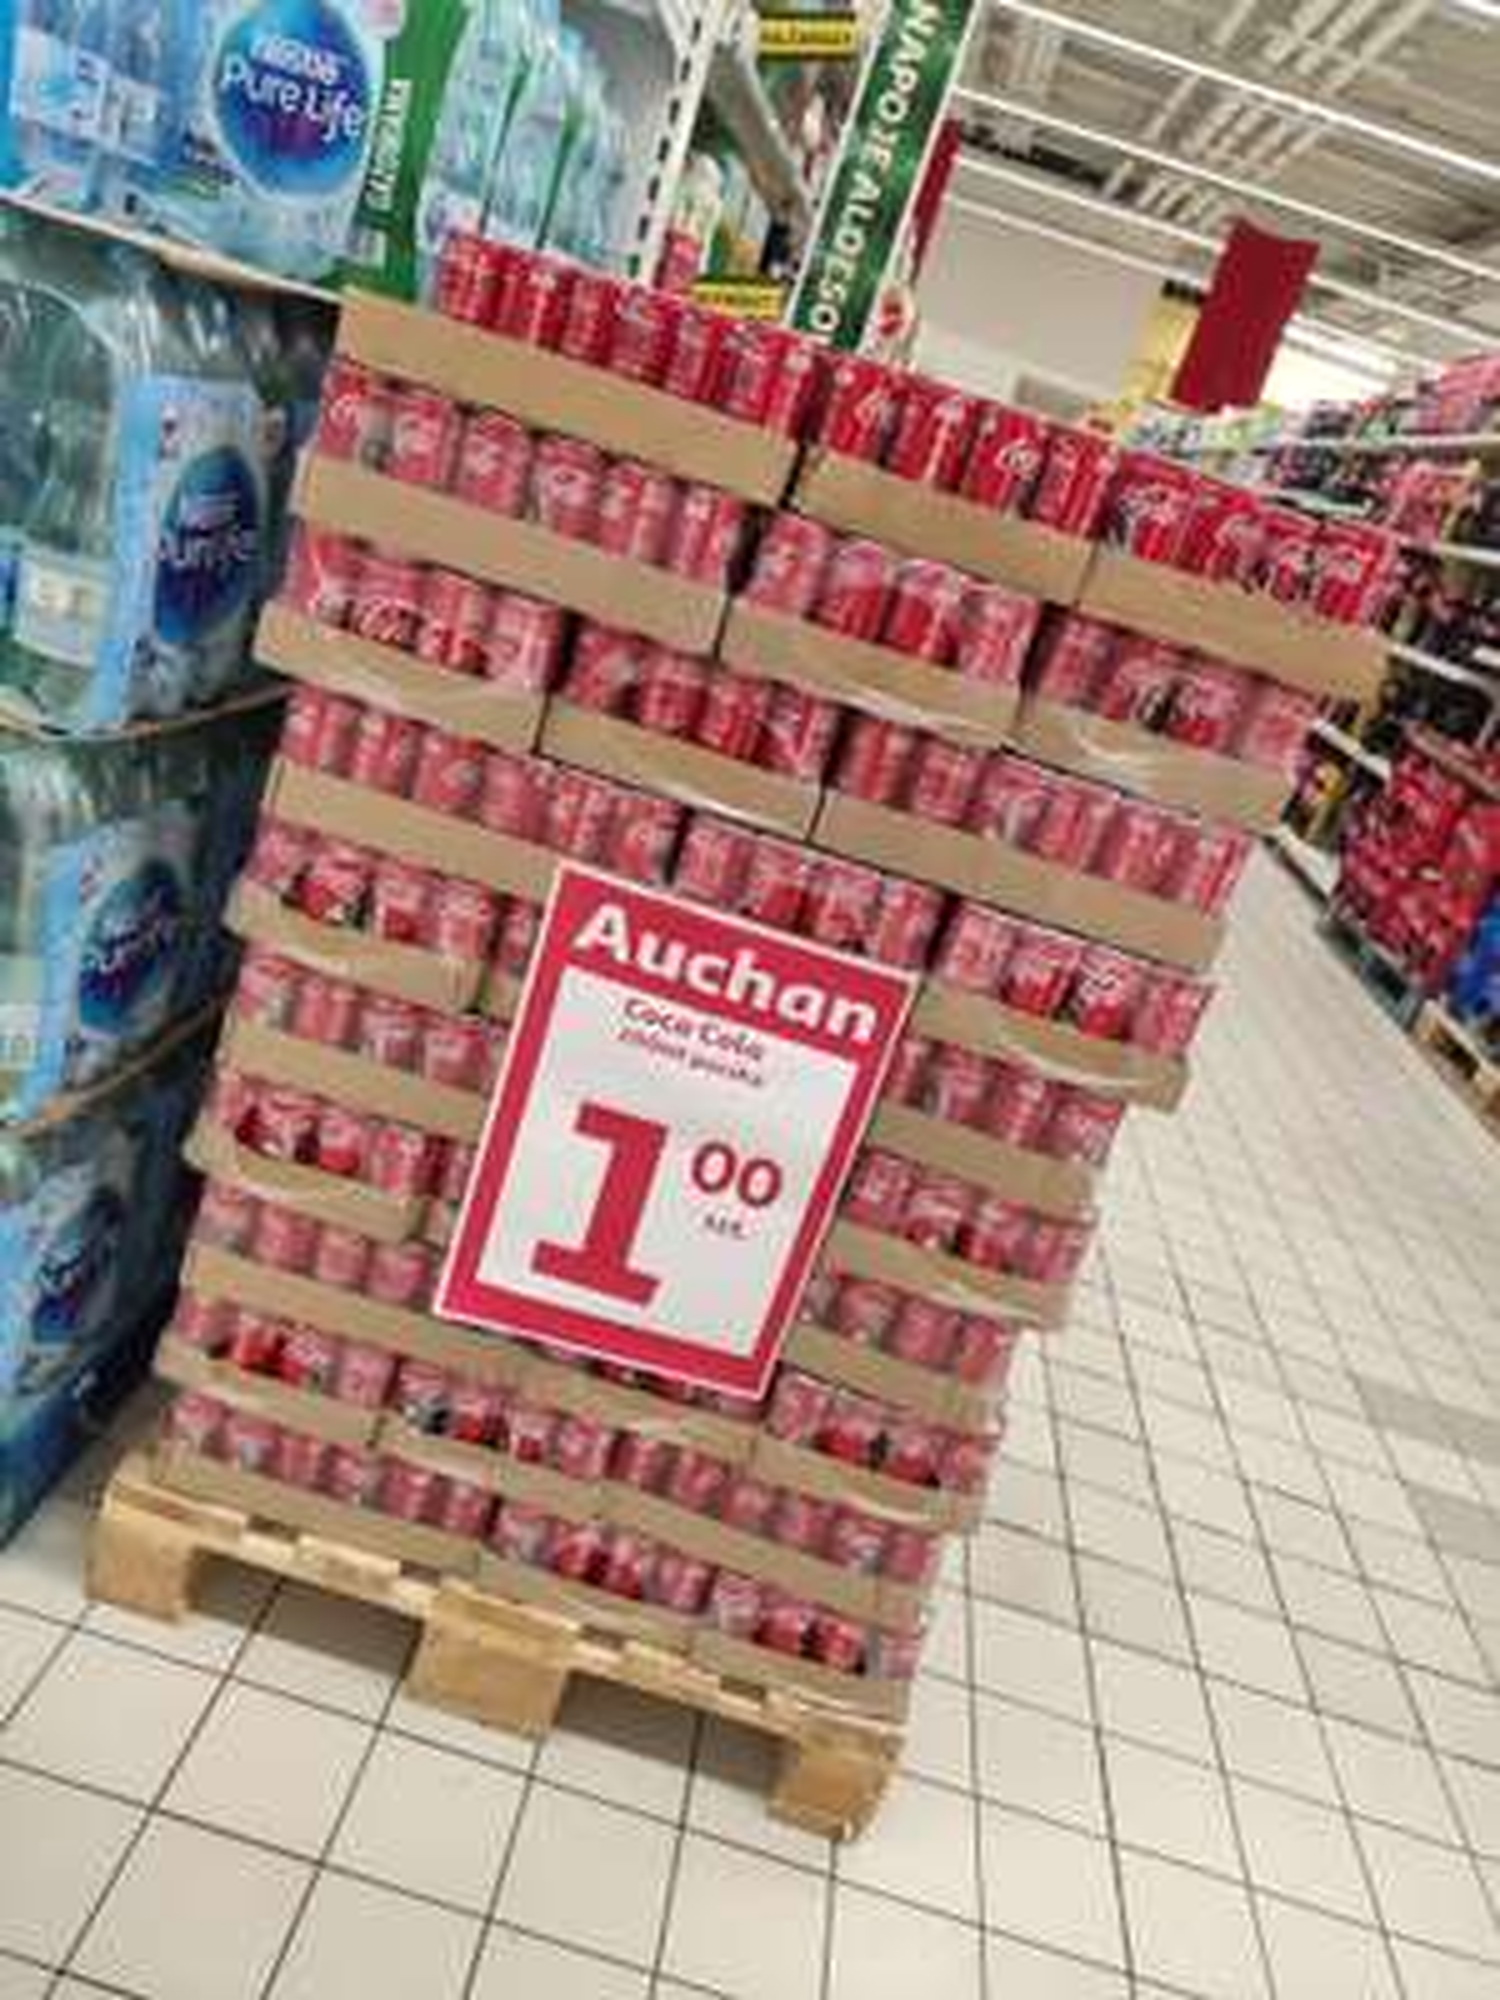 Coca Cola 200 ml 1zł |Auchan Warszawa Jubilerska